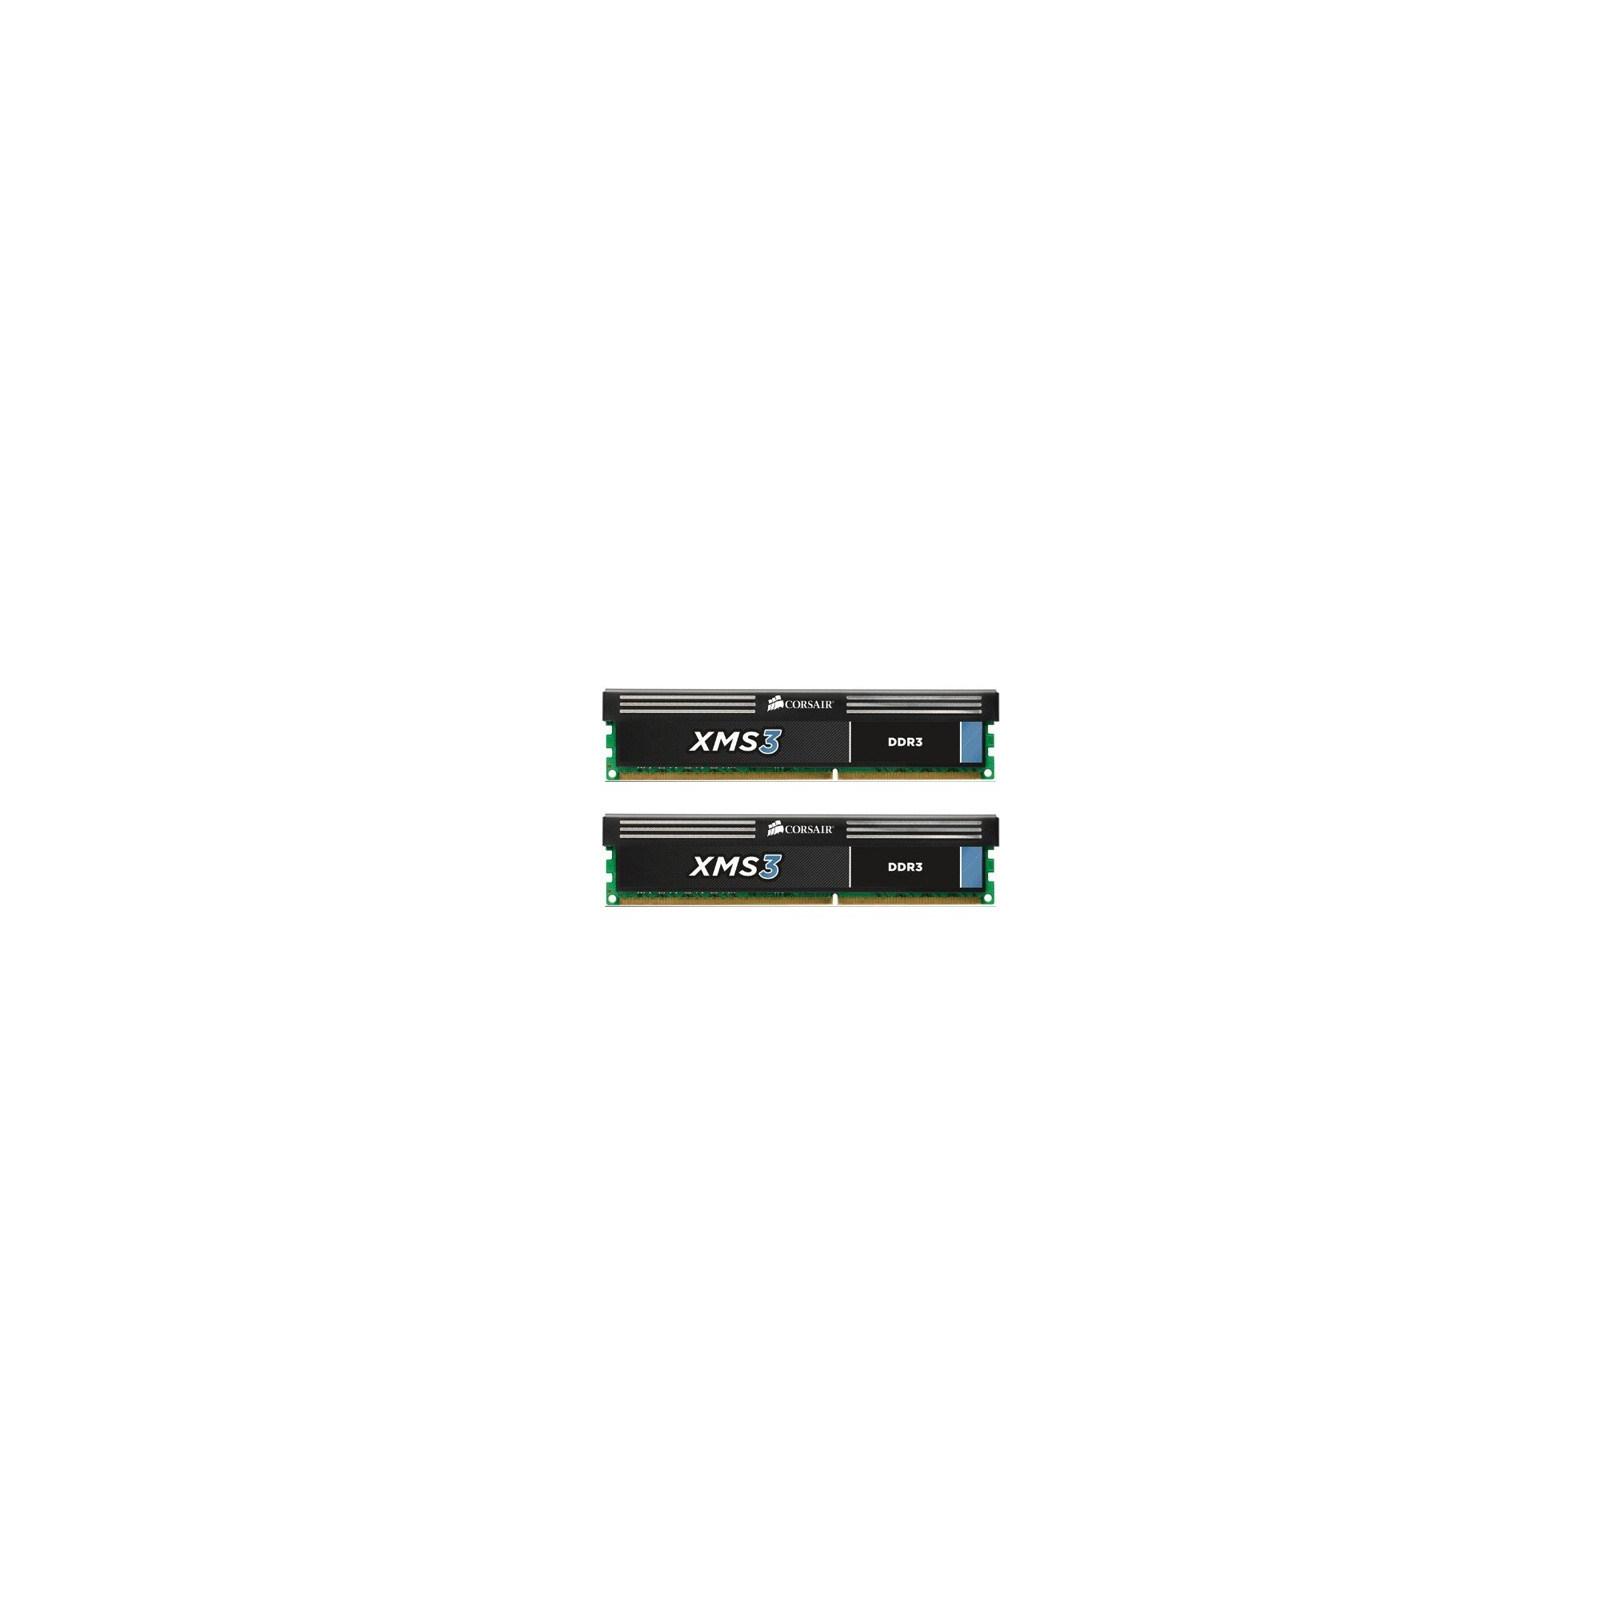 Модуль памяти для компьютера DDR3 8GB (2x4GB) 1600 MHz CORSAIR (CMX8GX3M2A1600C11)